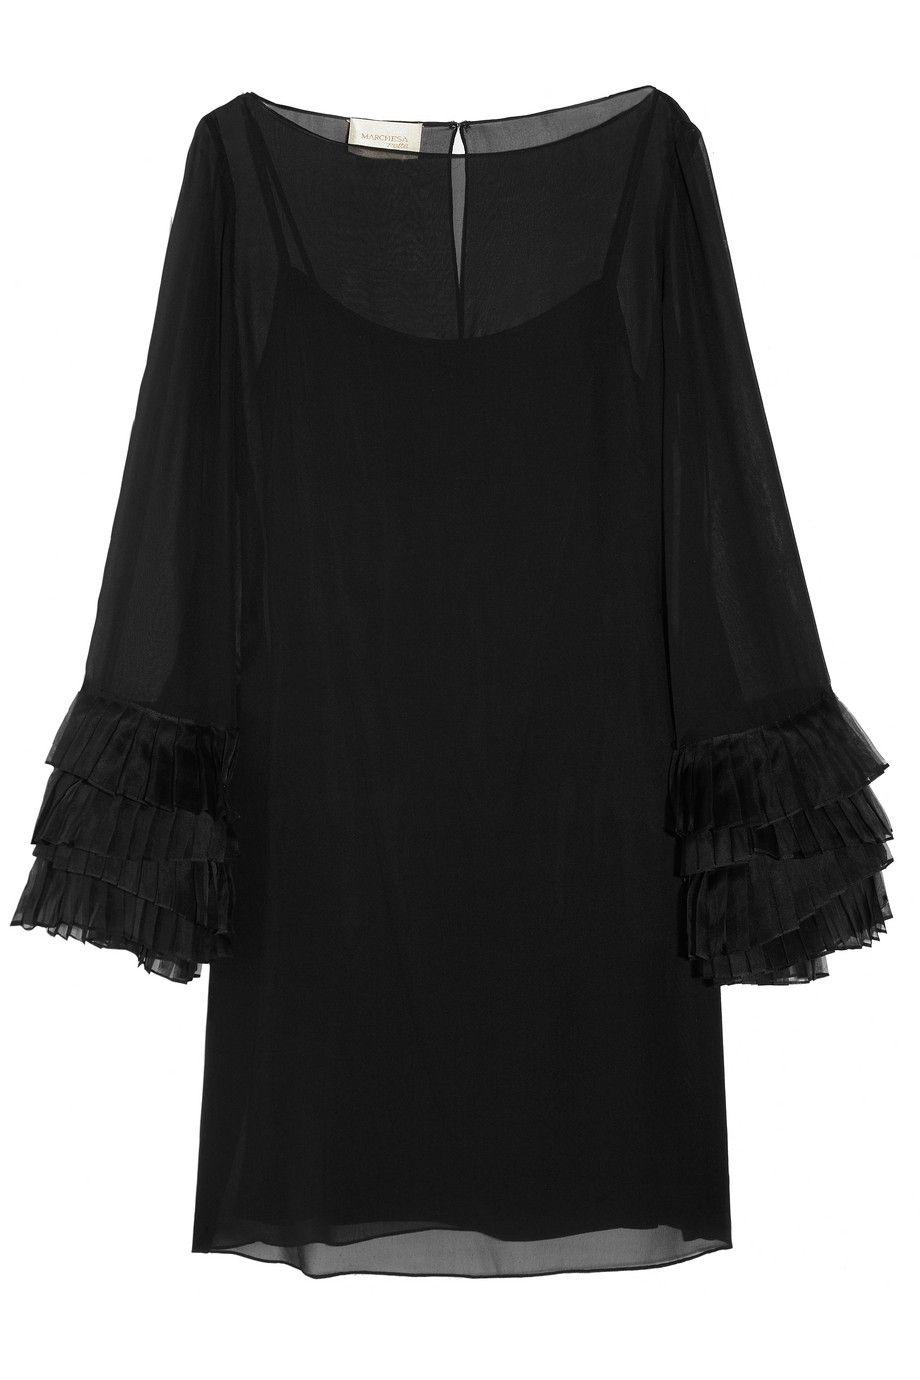 NOTEE BY MARCHESA: Organza trimmed silk chiffon dress